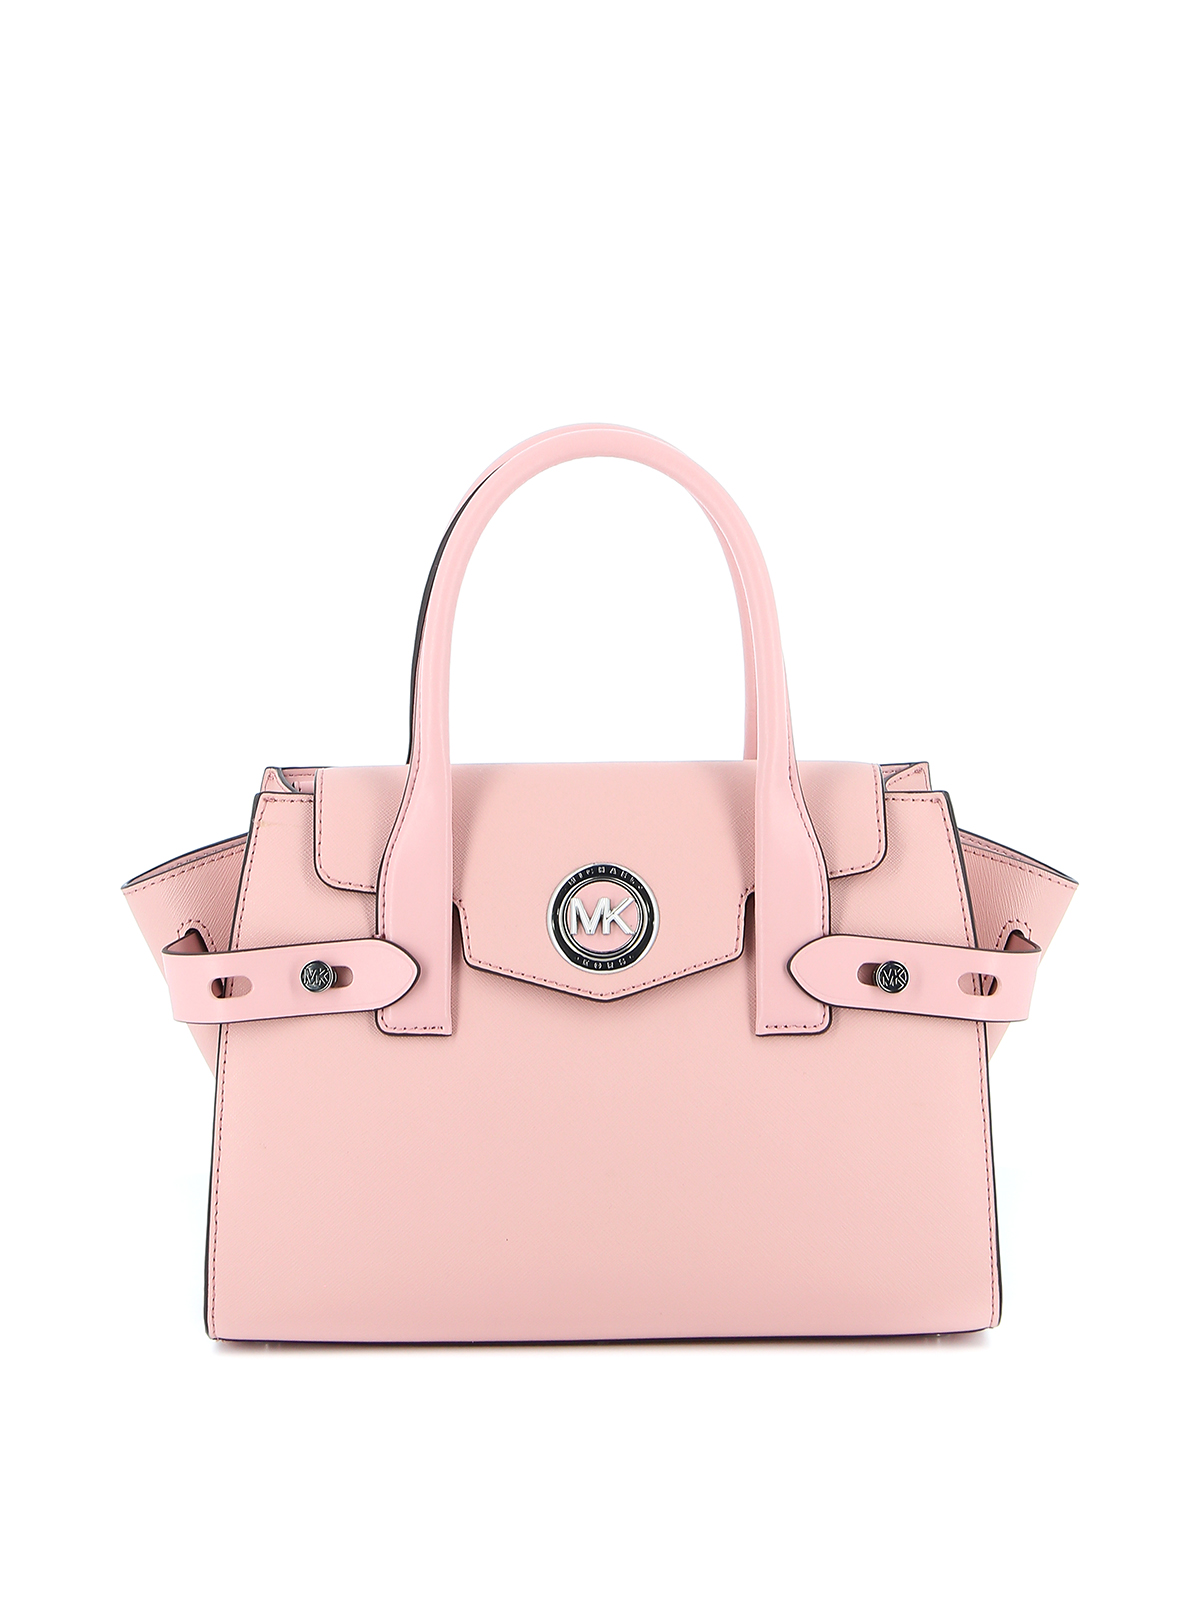 Michael Kors - Carmen S saffiano leather bag - کیف دستی ...